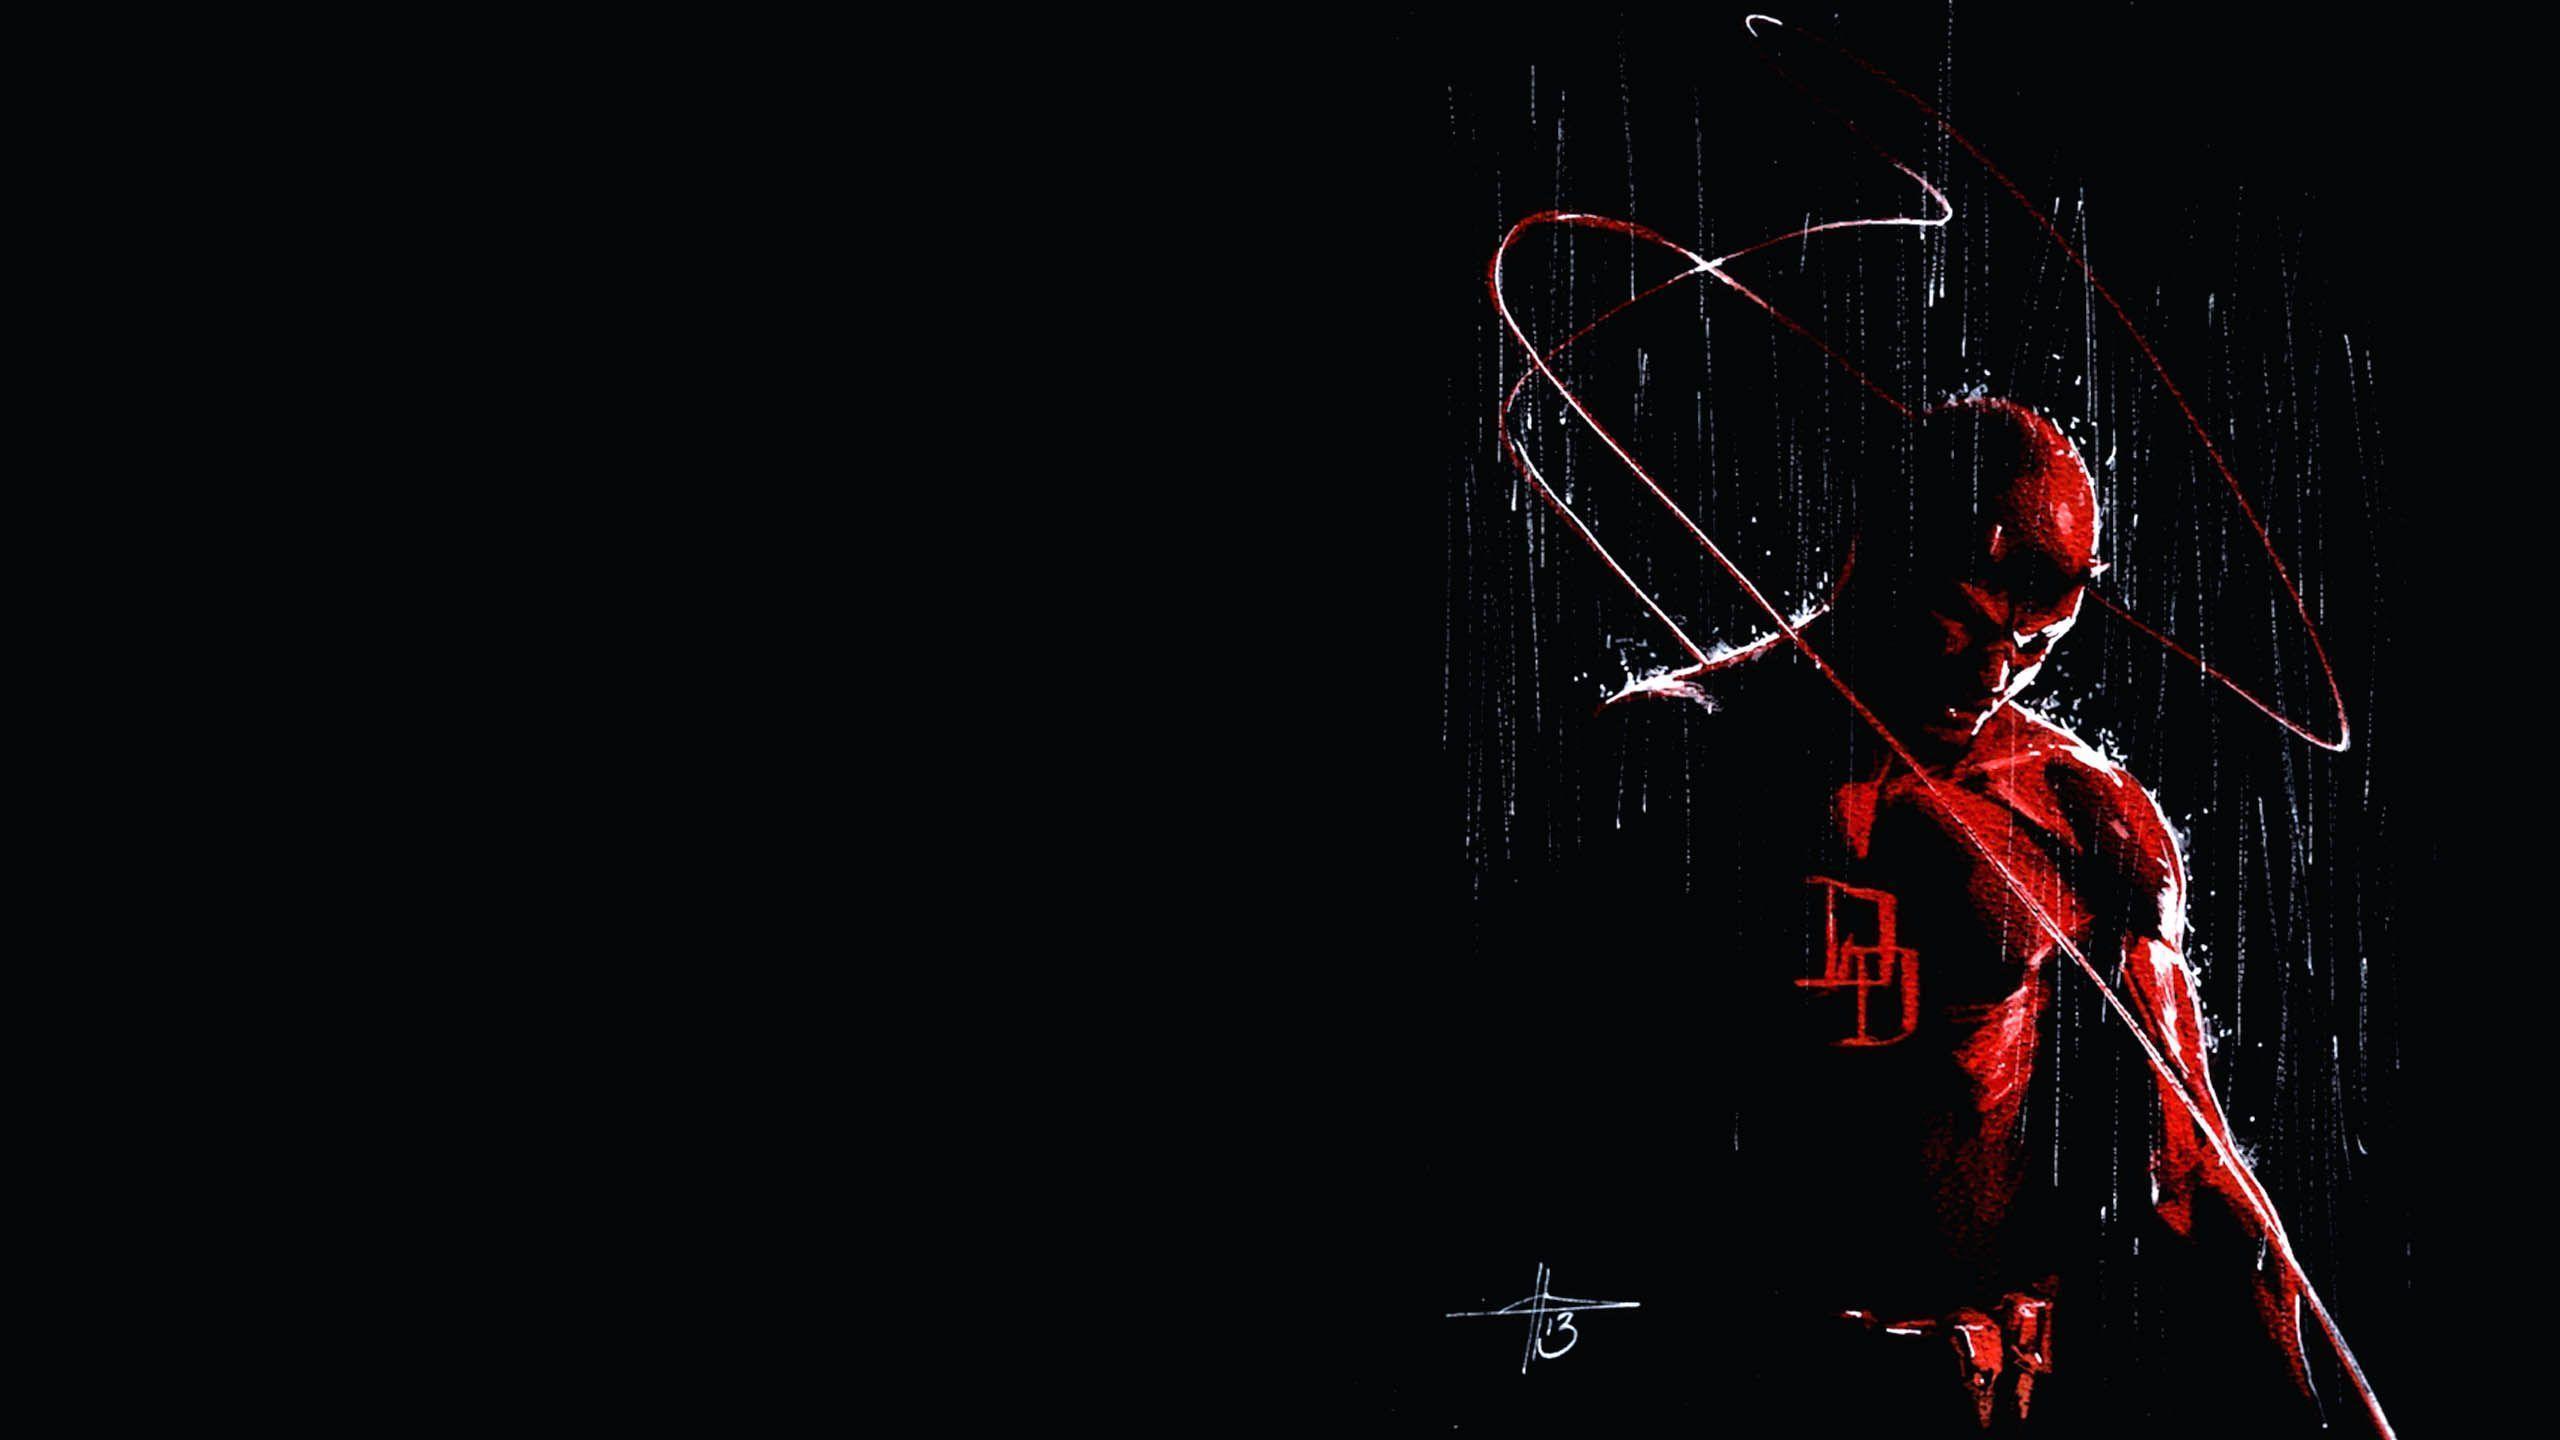 Daredevil Download Free Desktop Wallpapers